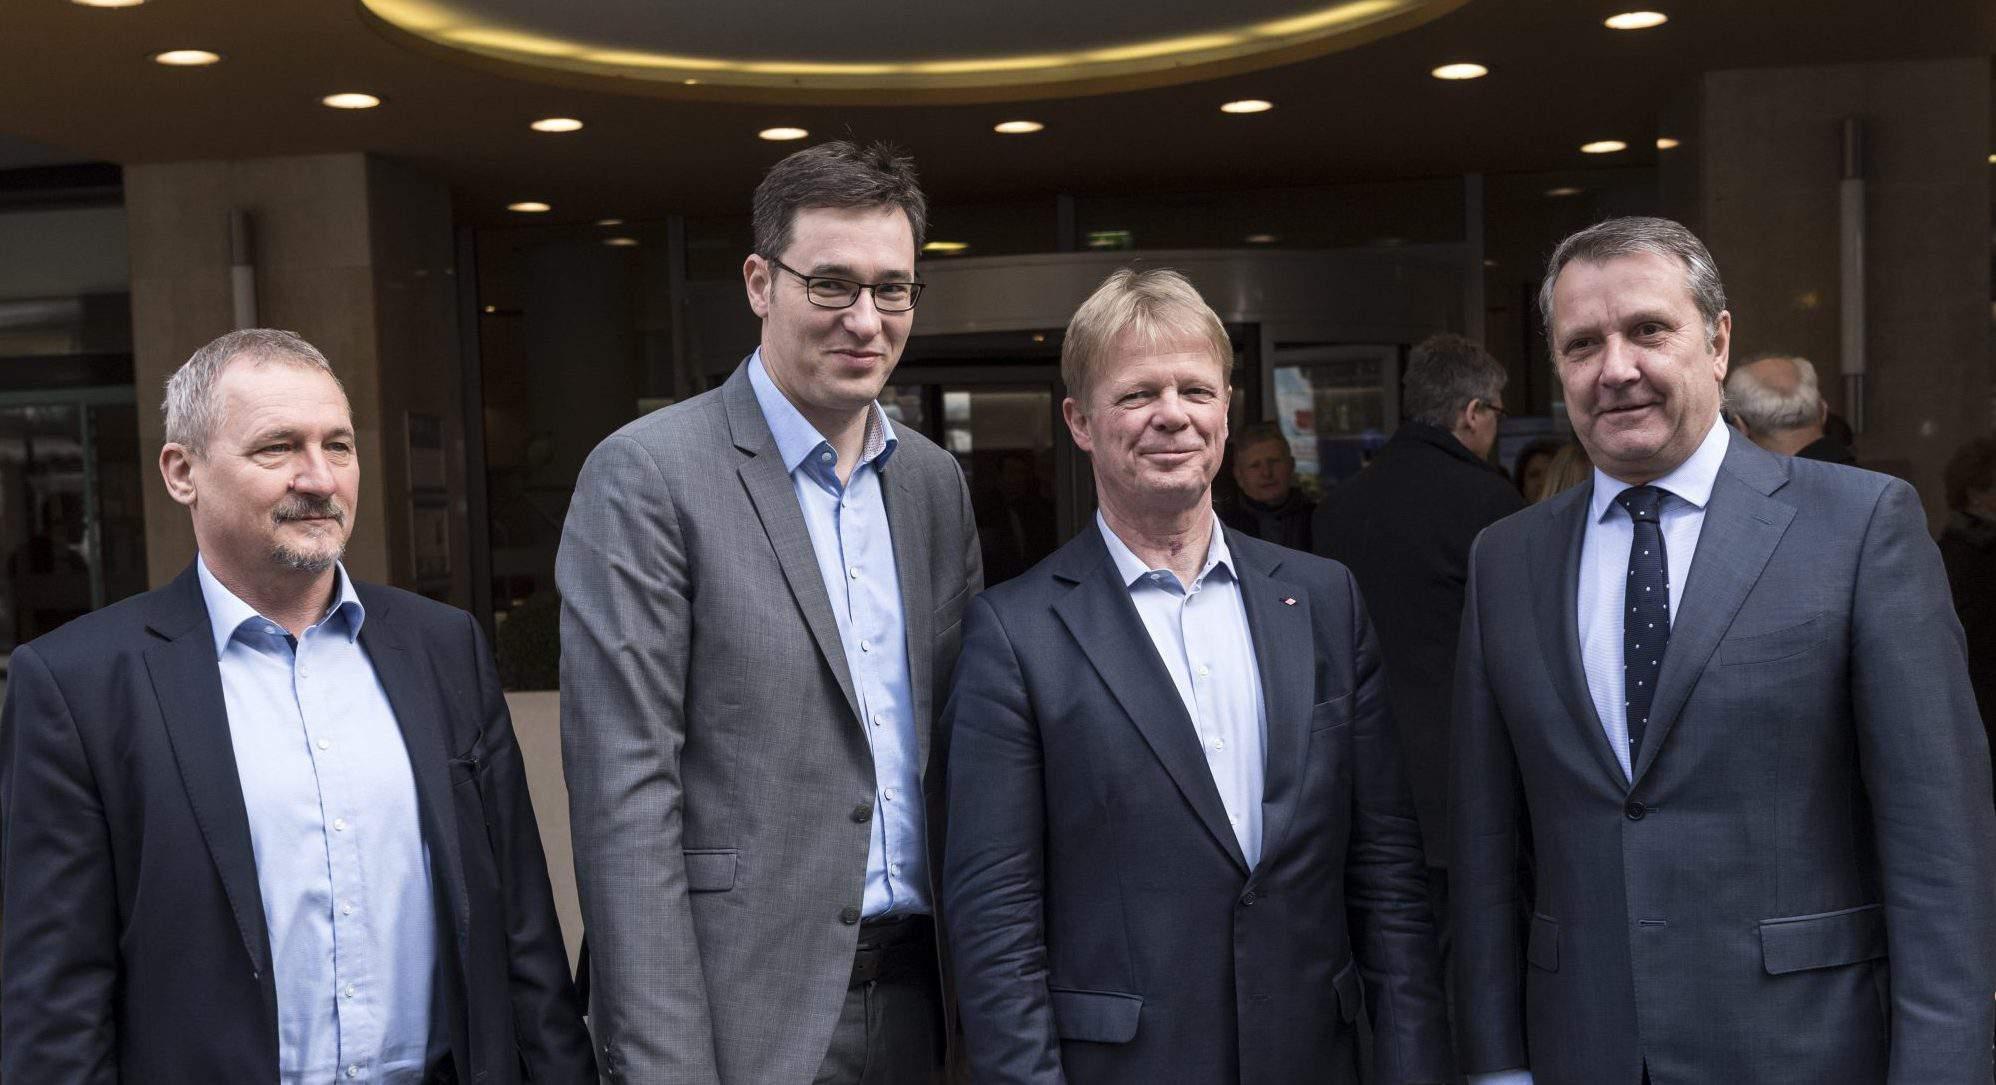 PM candidate Hungary leftists Karácsony Gergely Reiner Hoffmann